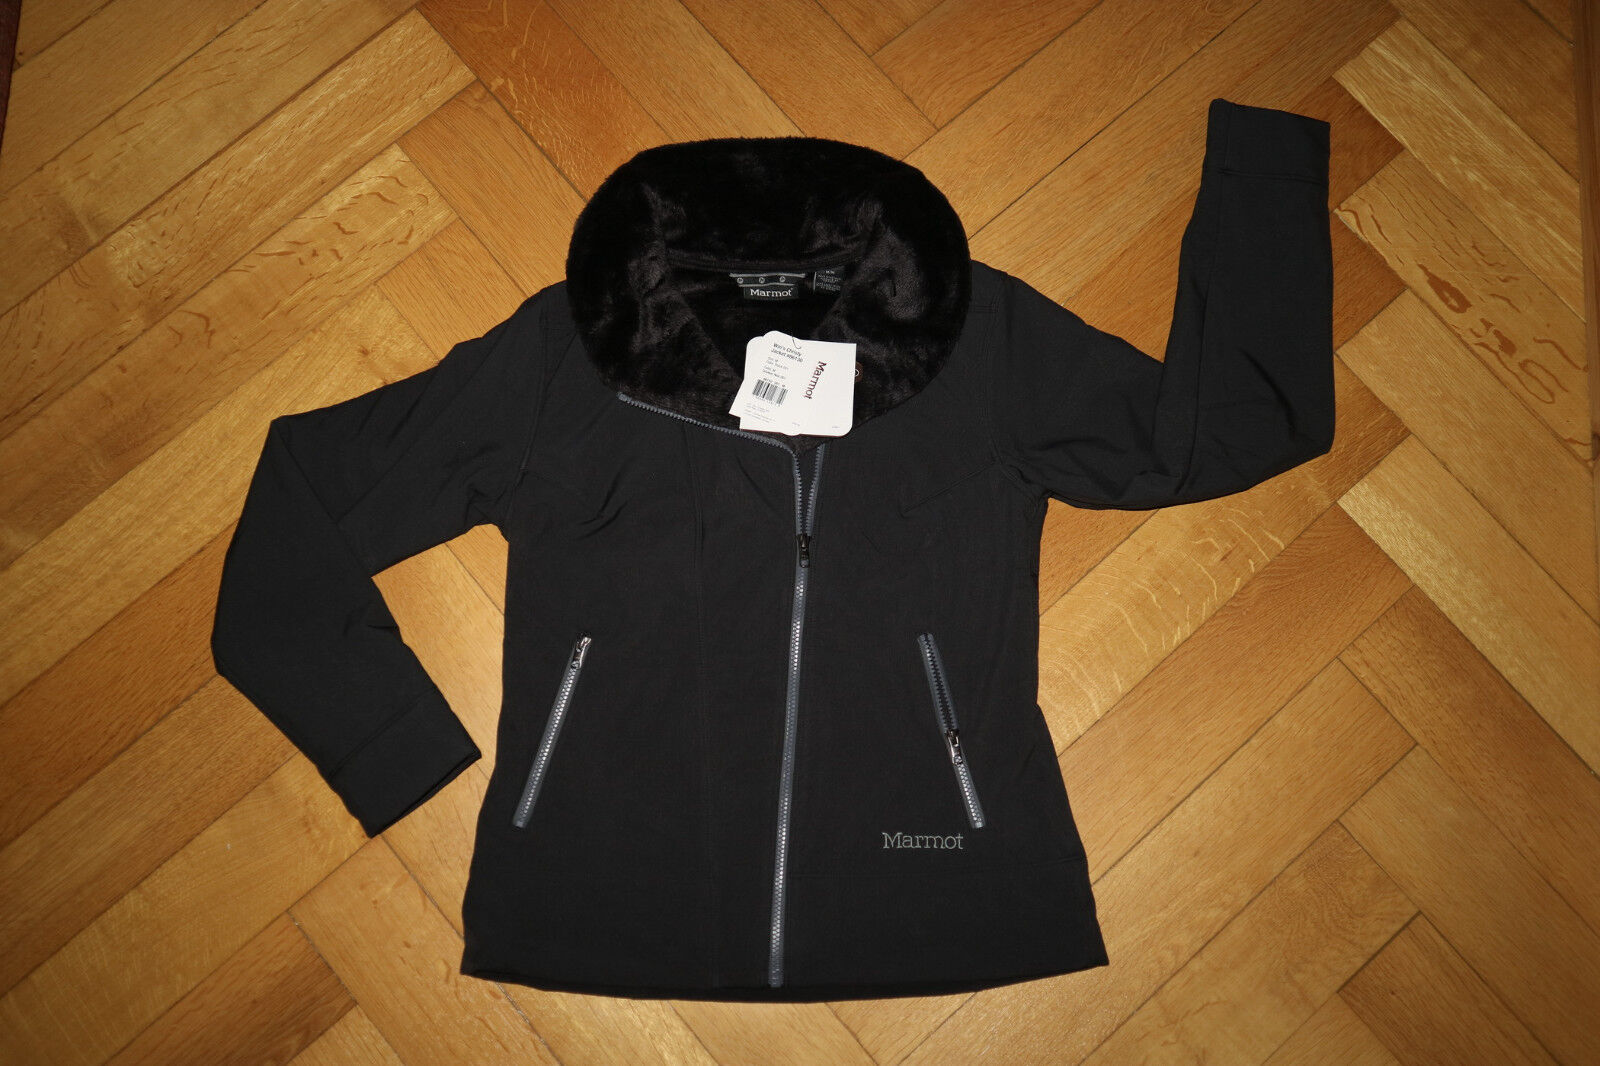 Marmot Christy m1 Softshell Giacca da donna nero con calda in pile-MANGIME UVP